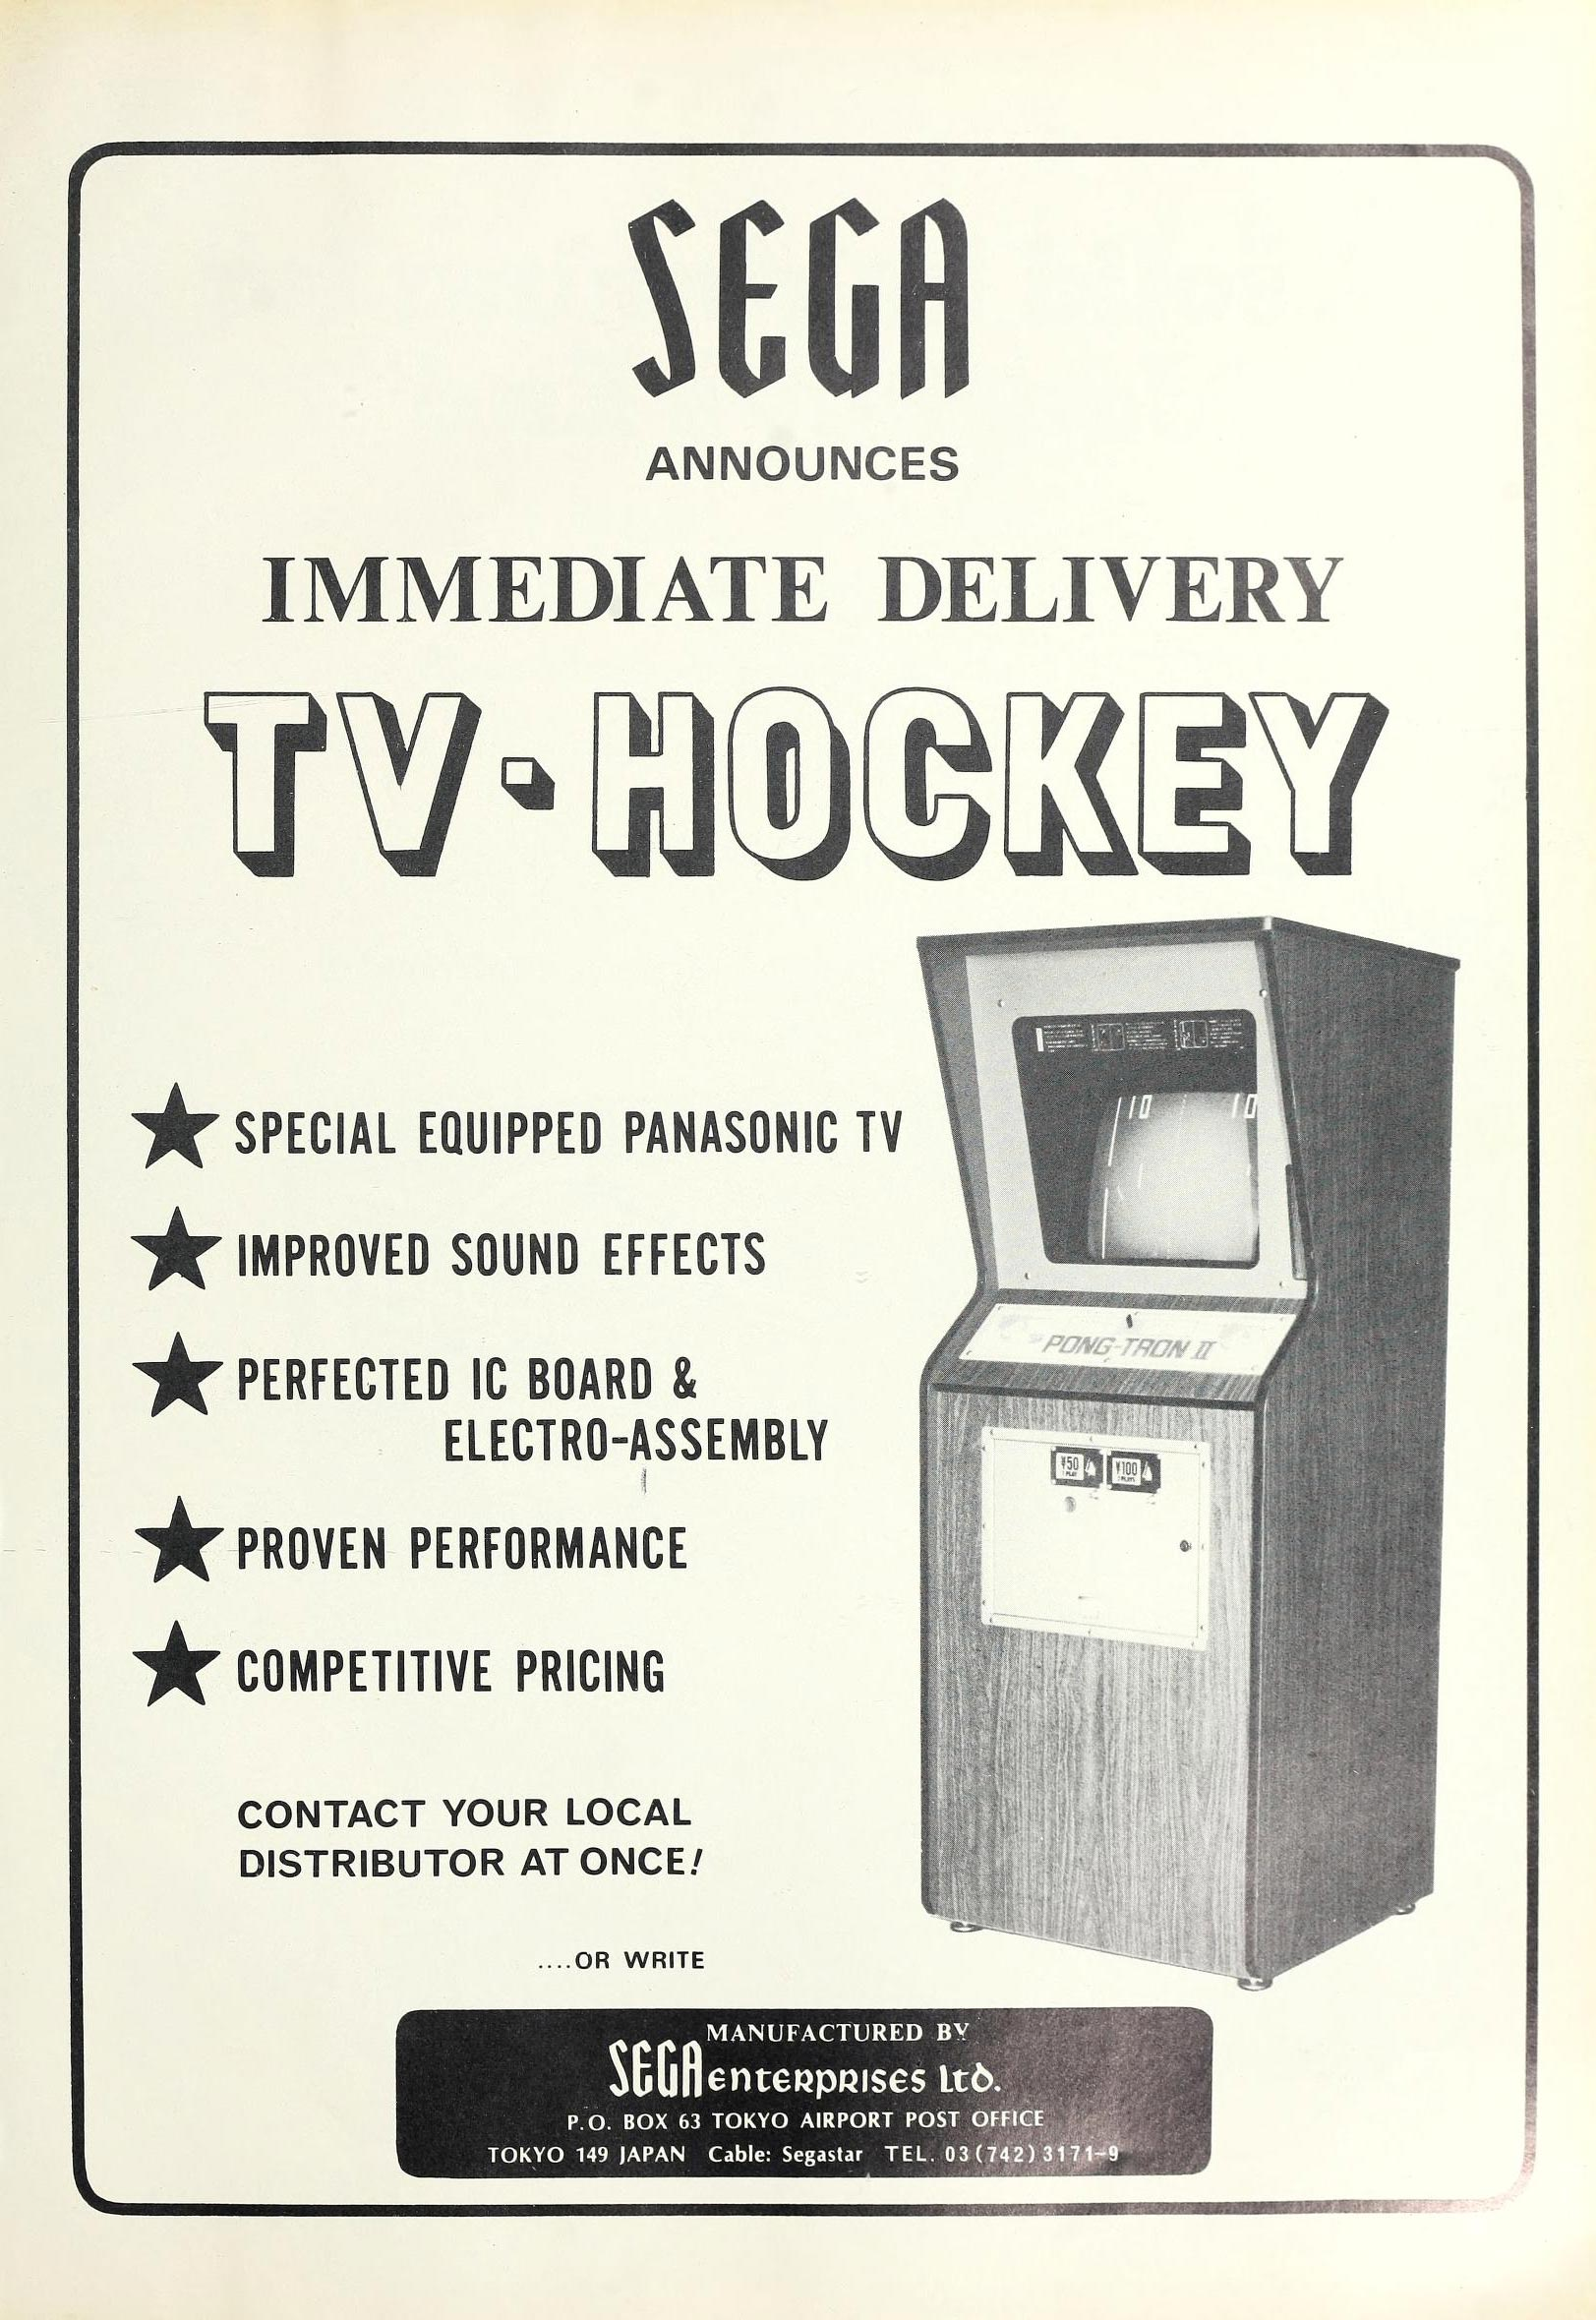 TV Hockey, a PONG video game by Sega